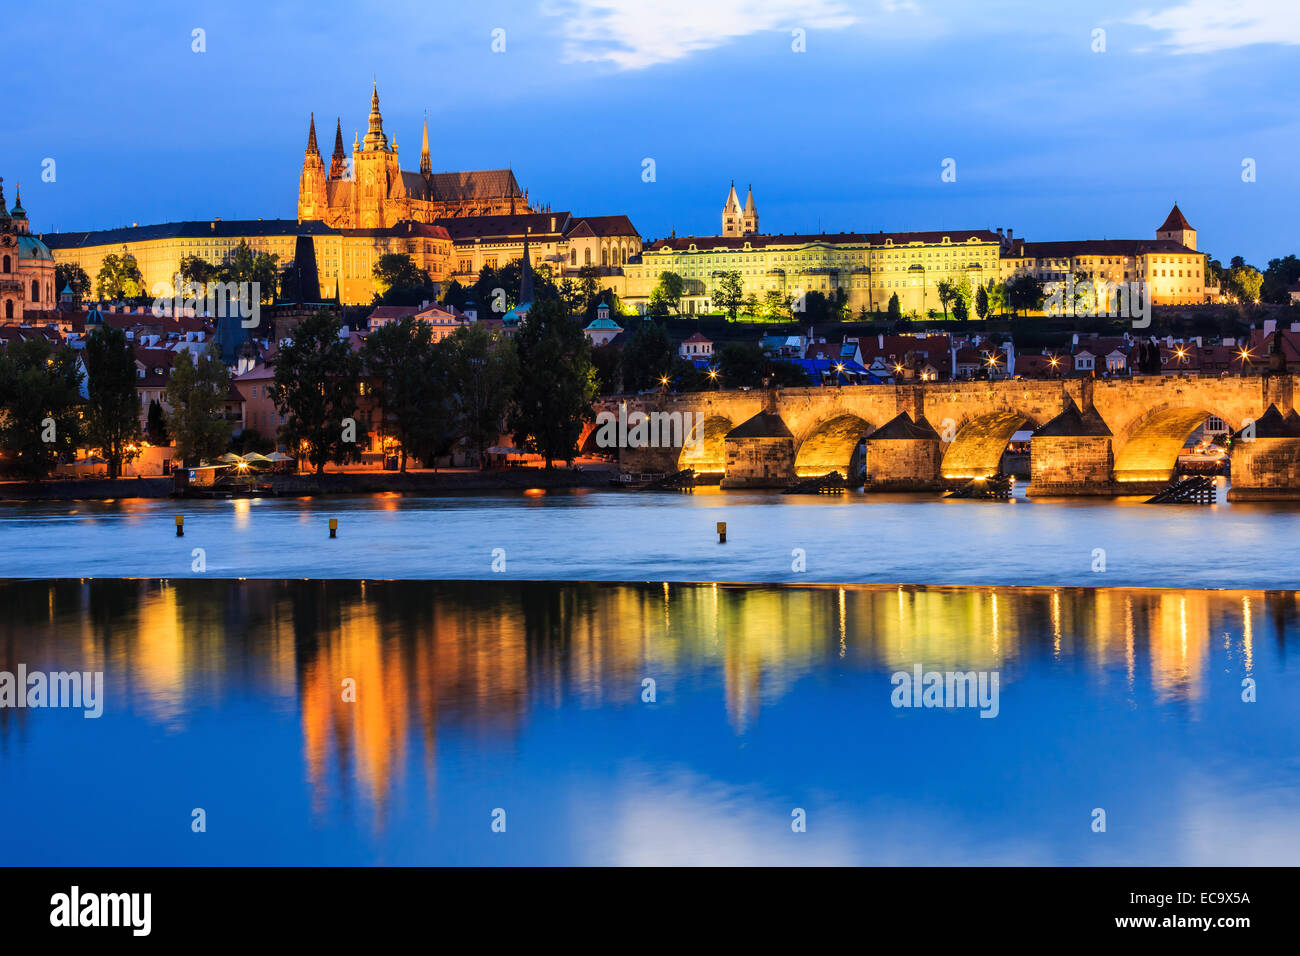 Praga, República Checa Imagen De Stock